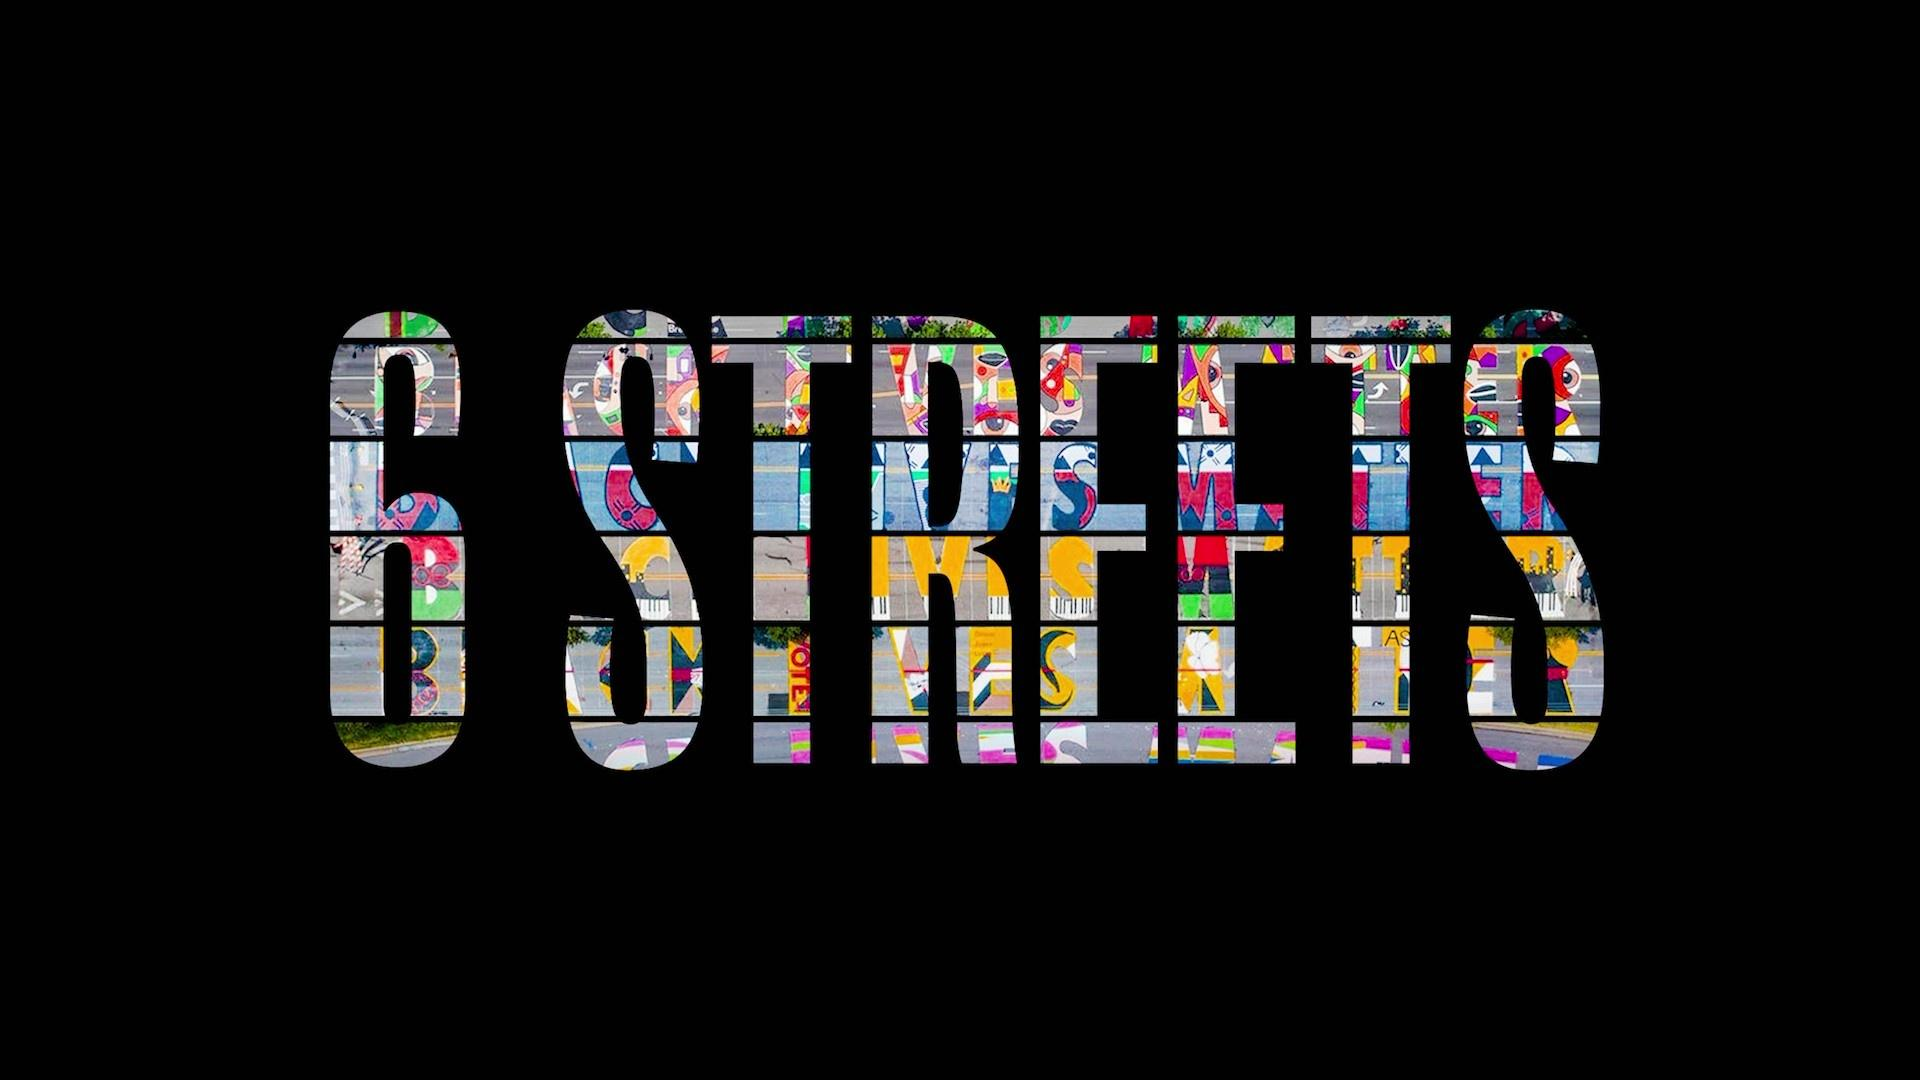 6 STREETS